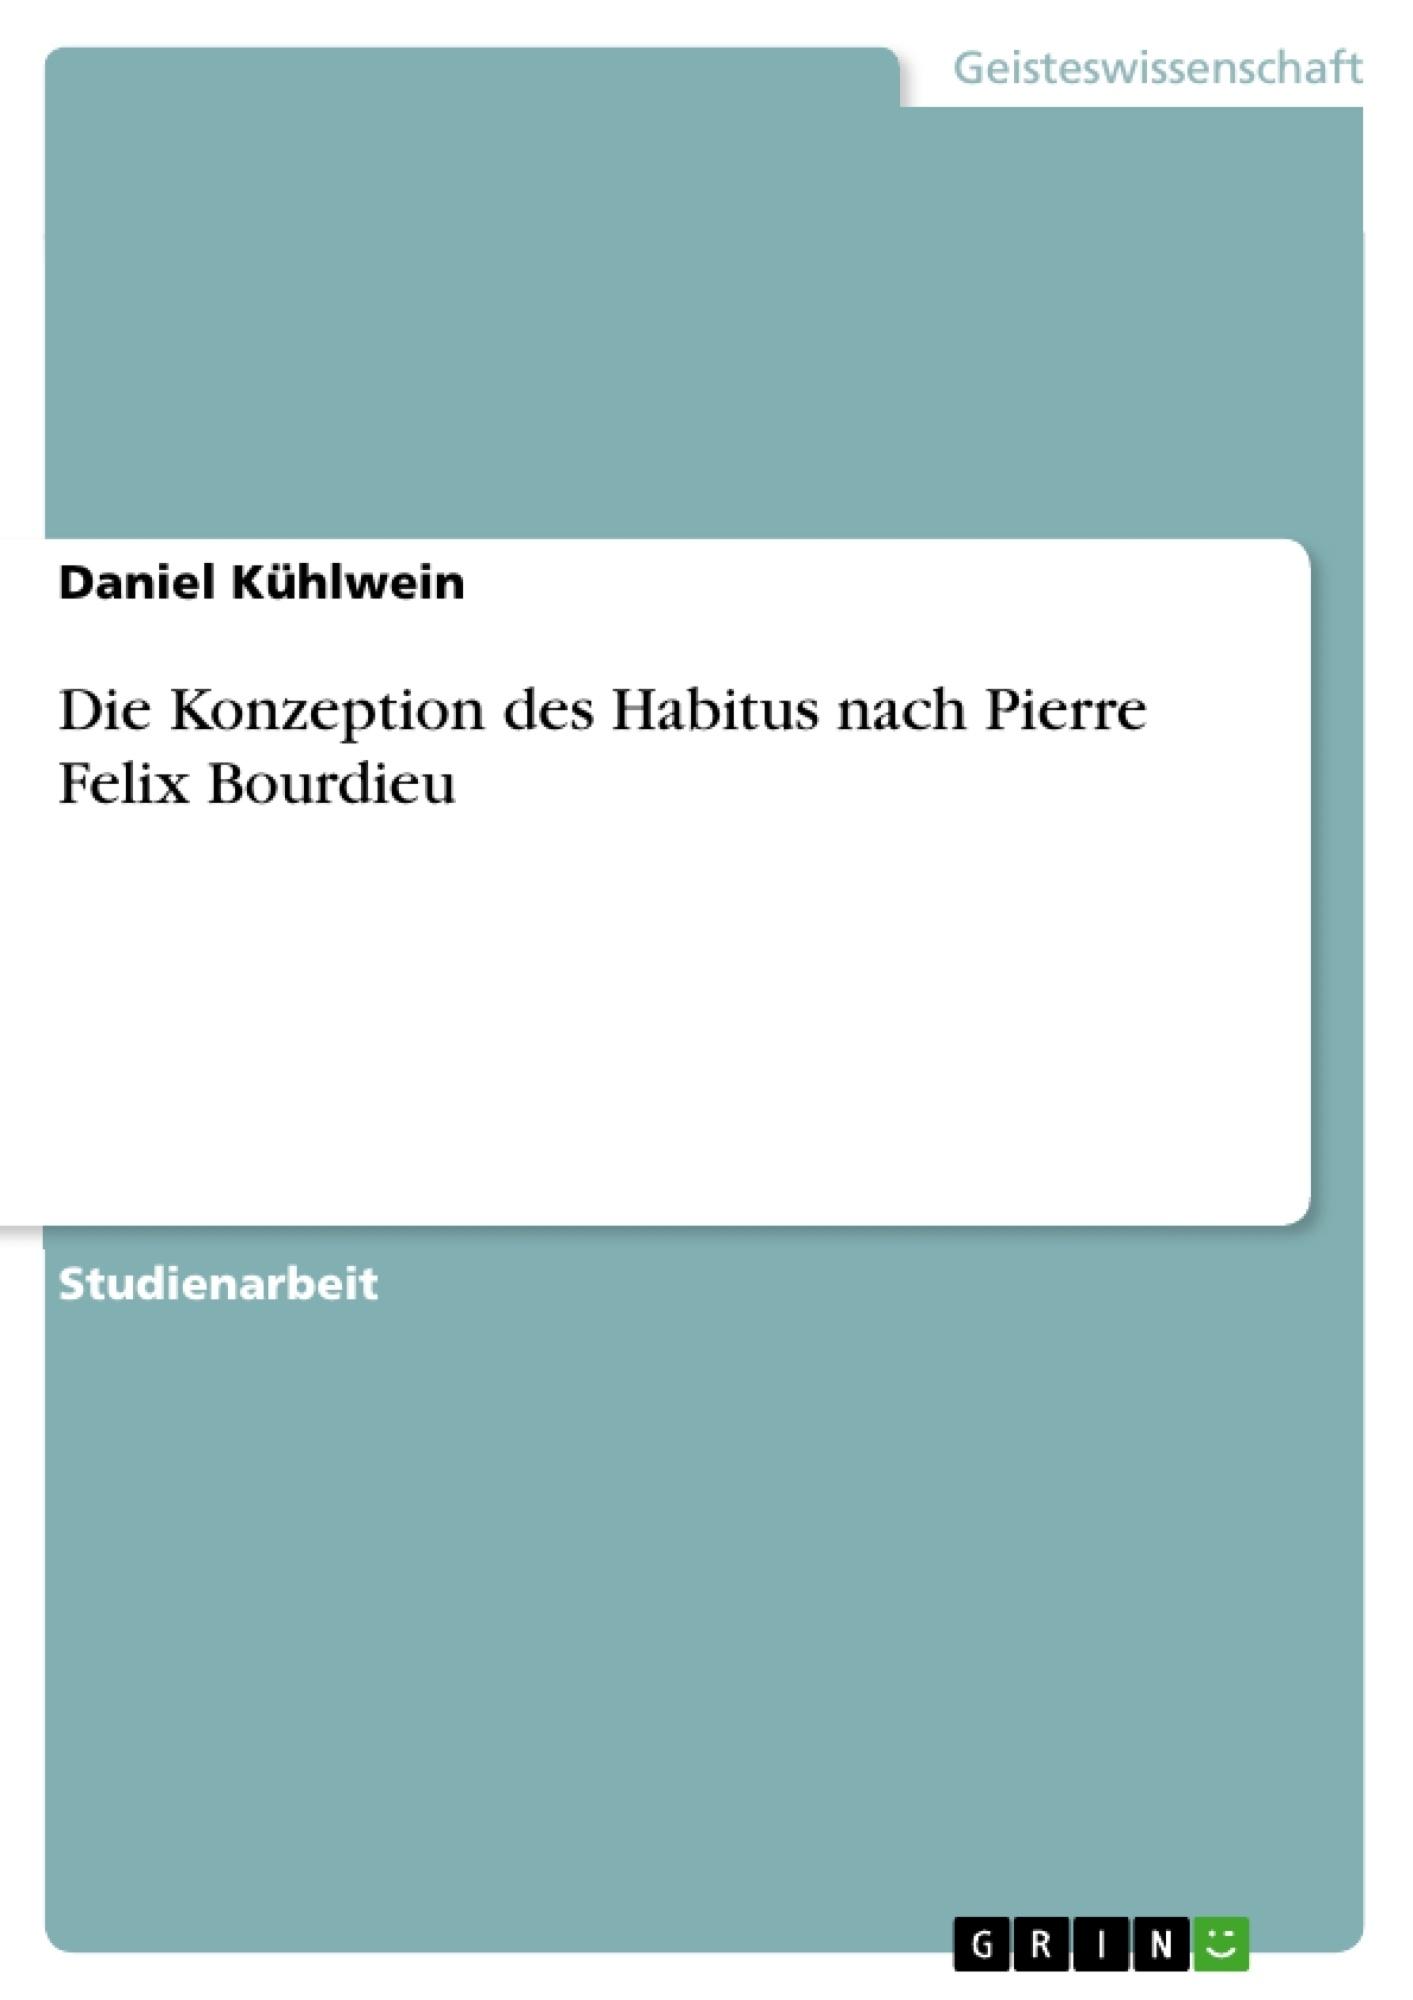 Titel: Die Konzeption des Habitus nach Pierre Felix Bourdieu